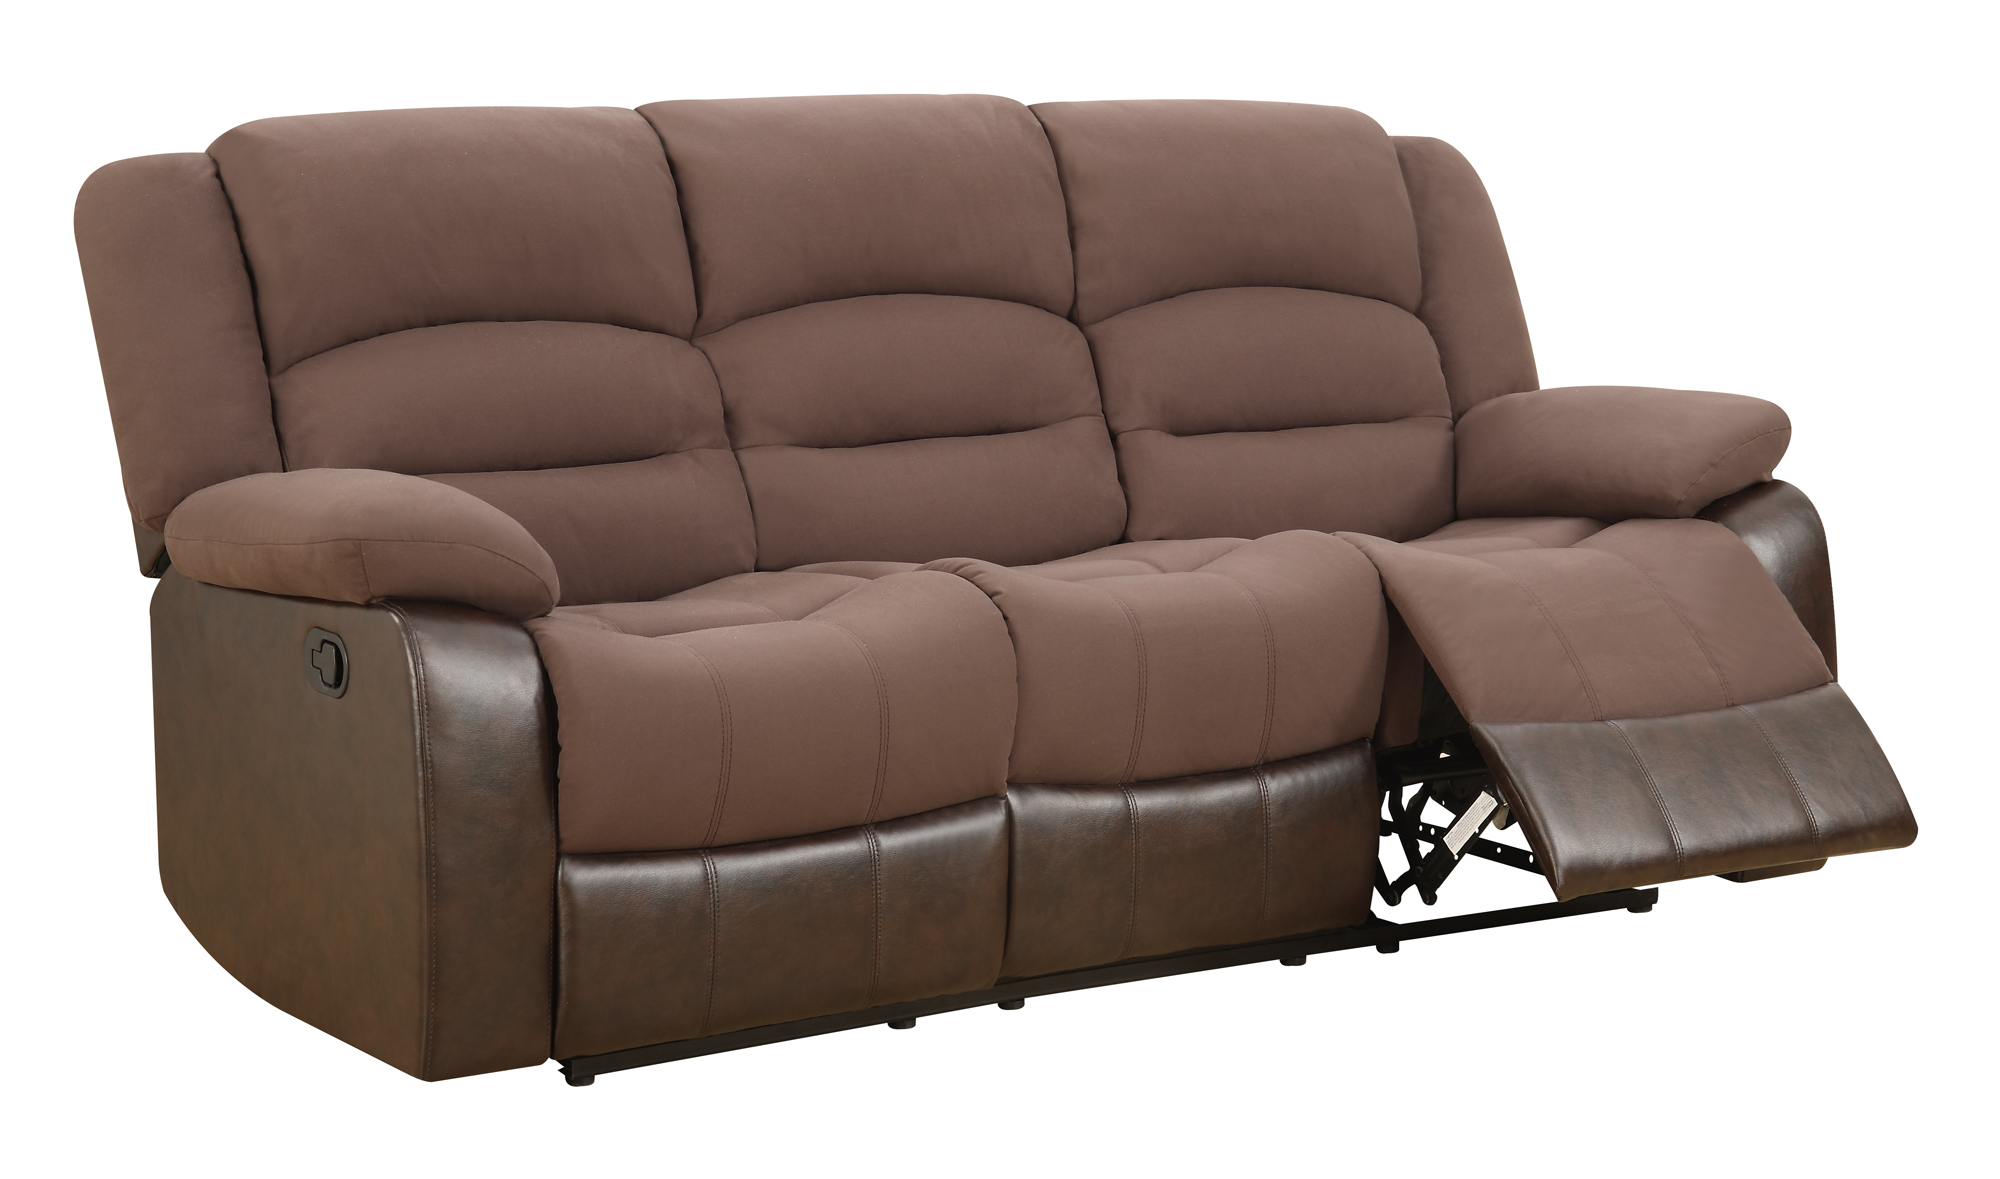 u98243 chocolate pu reclining sofa by global furniture. Black Bedroom Furniture Sets. Home Design Ideas